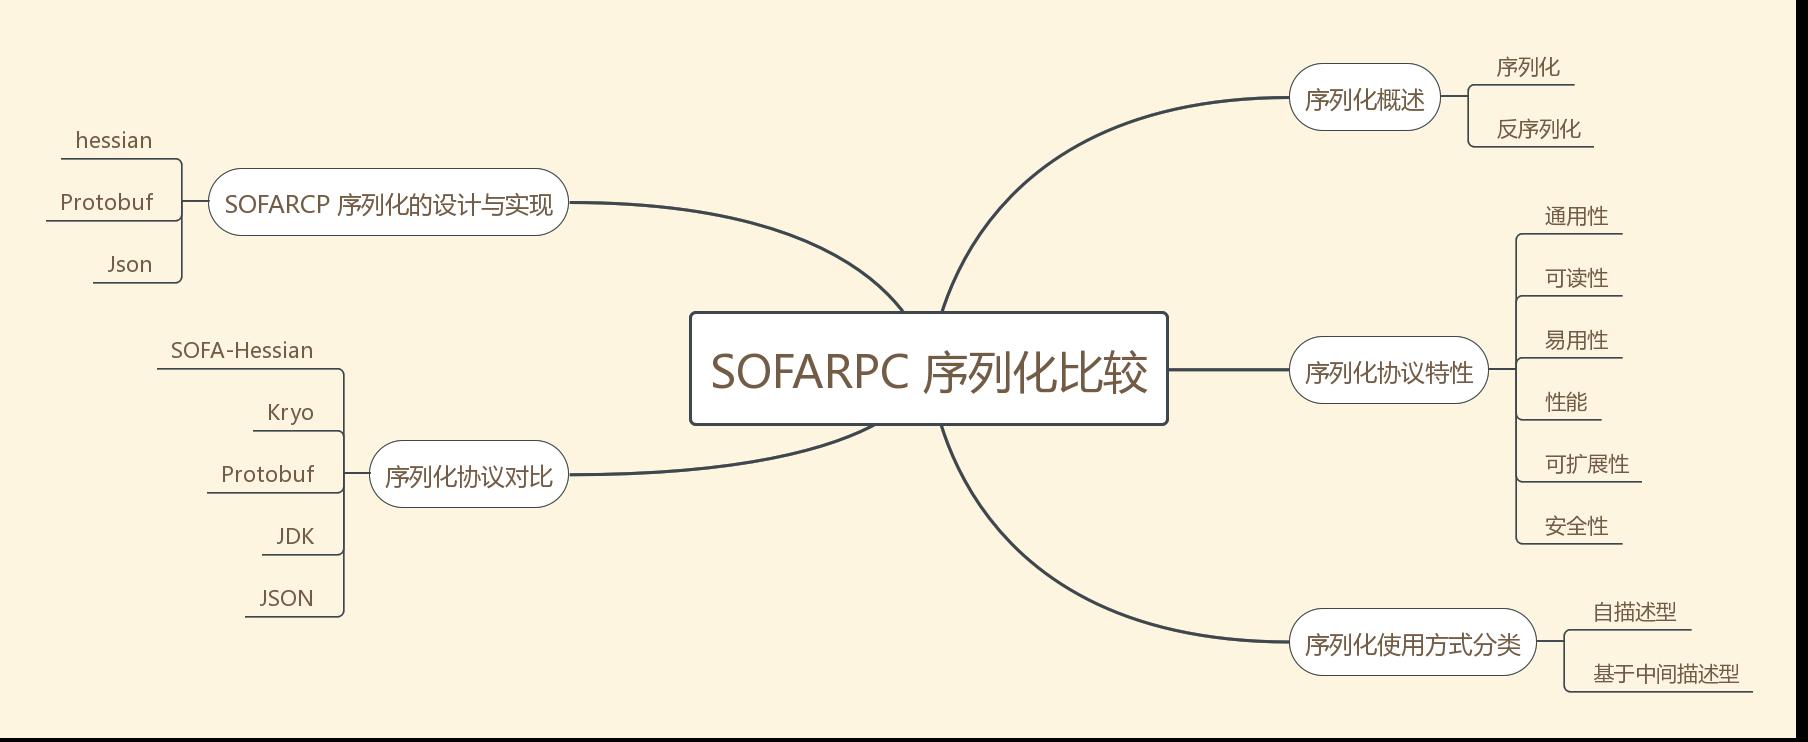 SOFARPC 序列化比较.png | center | 827x339